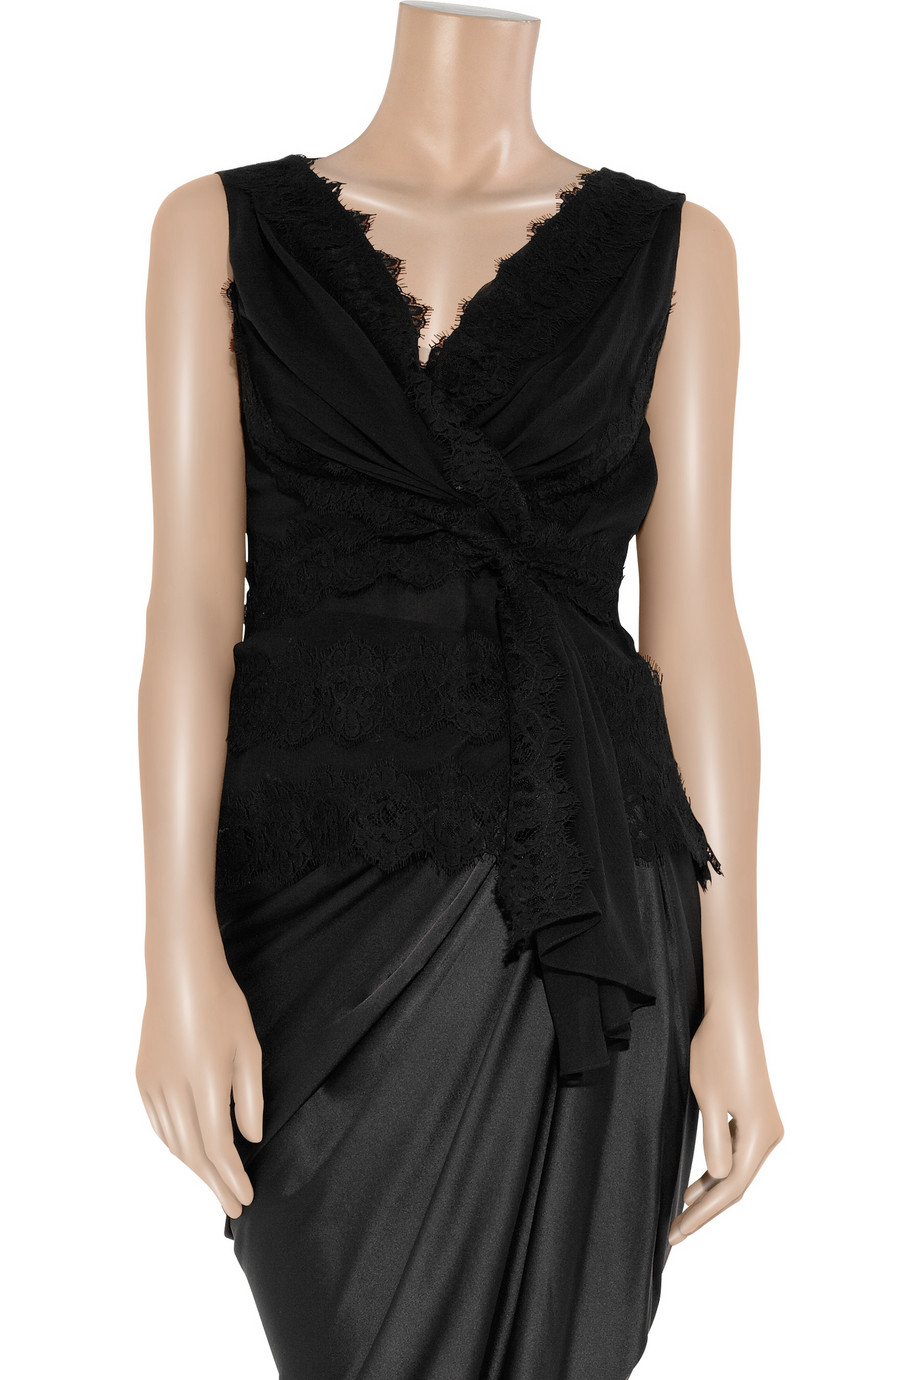 Lyst Oscar De La Renta Silk Chiffon And Lace Top In Black